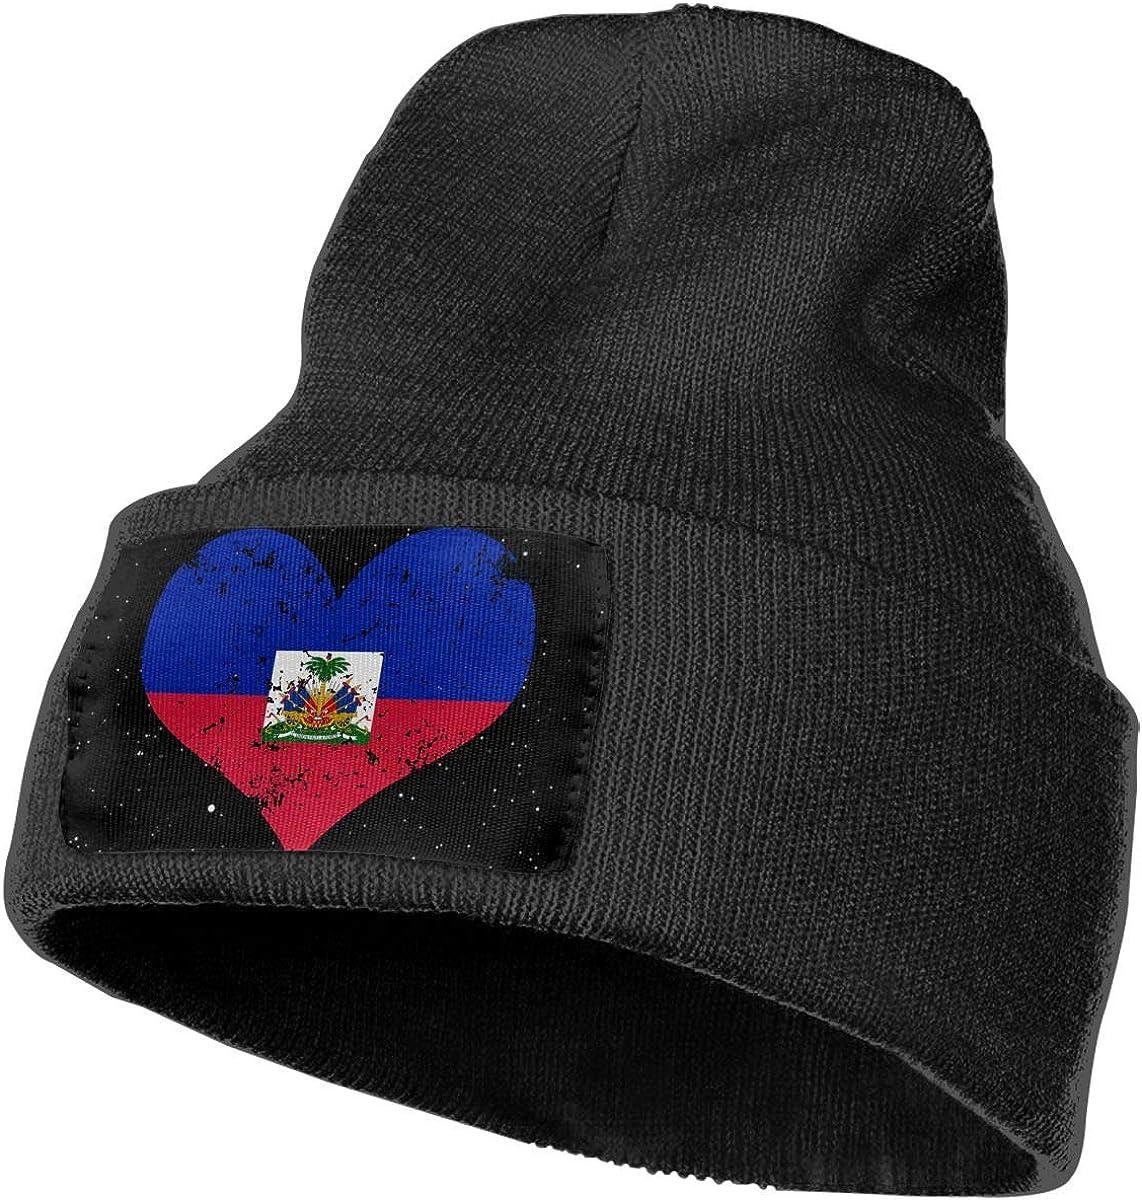 Haiti Heart Flag Ski Cap Men Women Knit Hats Stretchy /& Soft Beanie